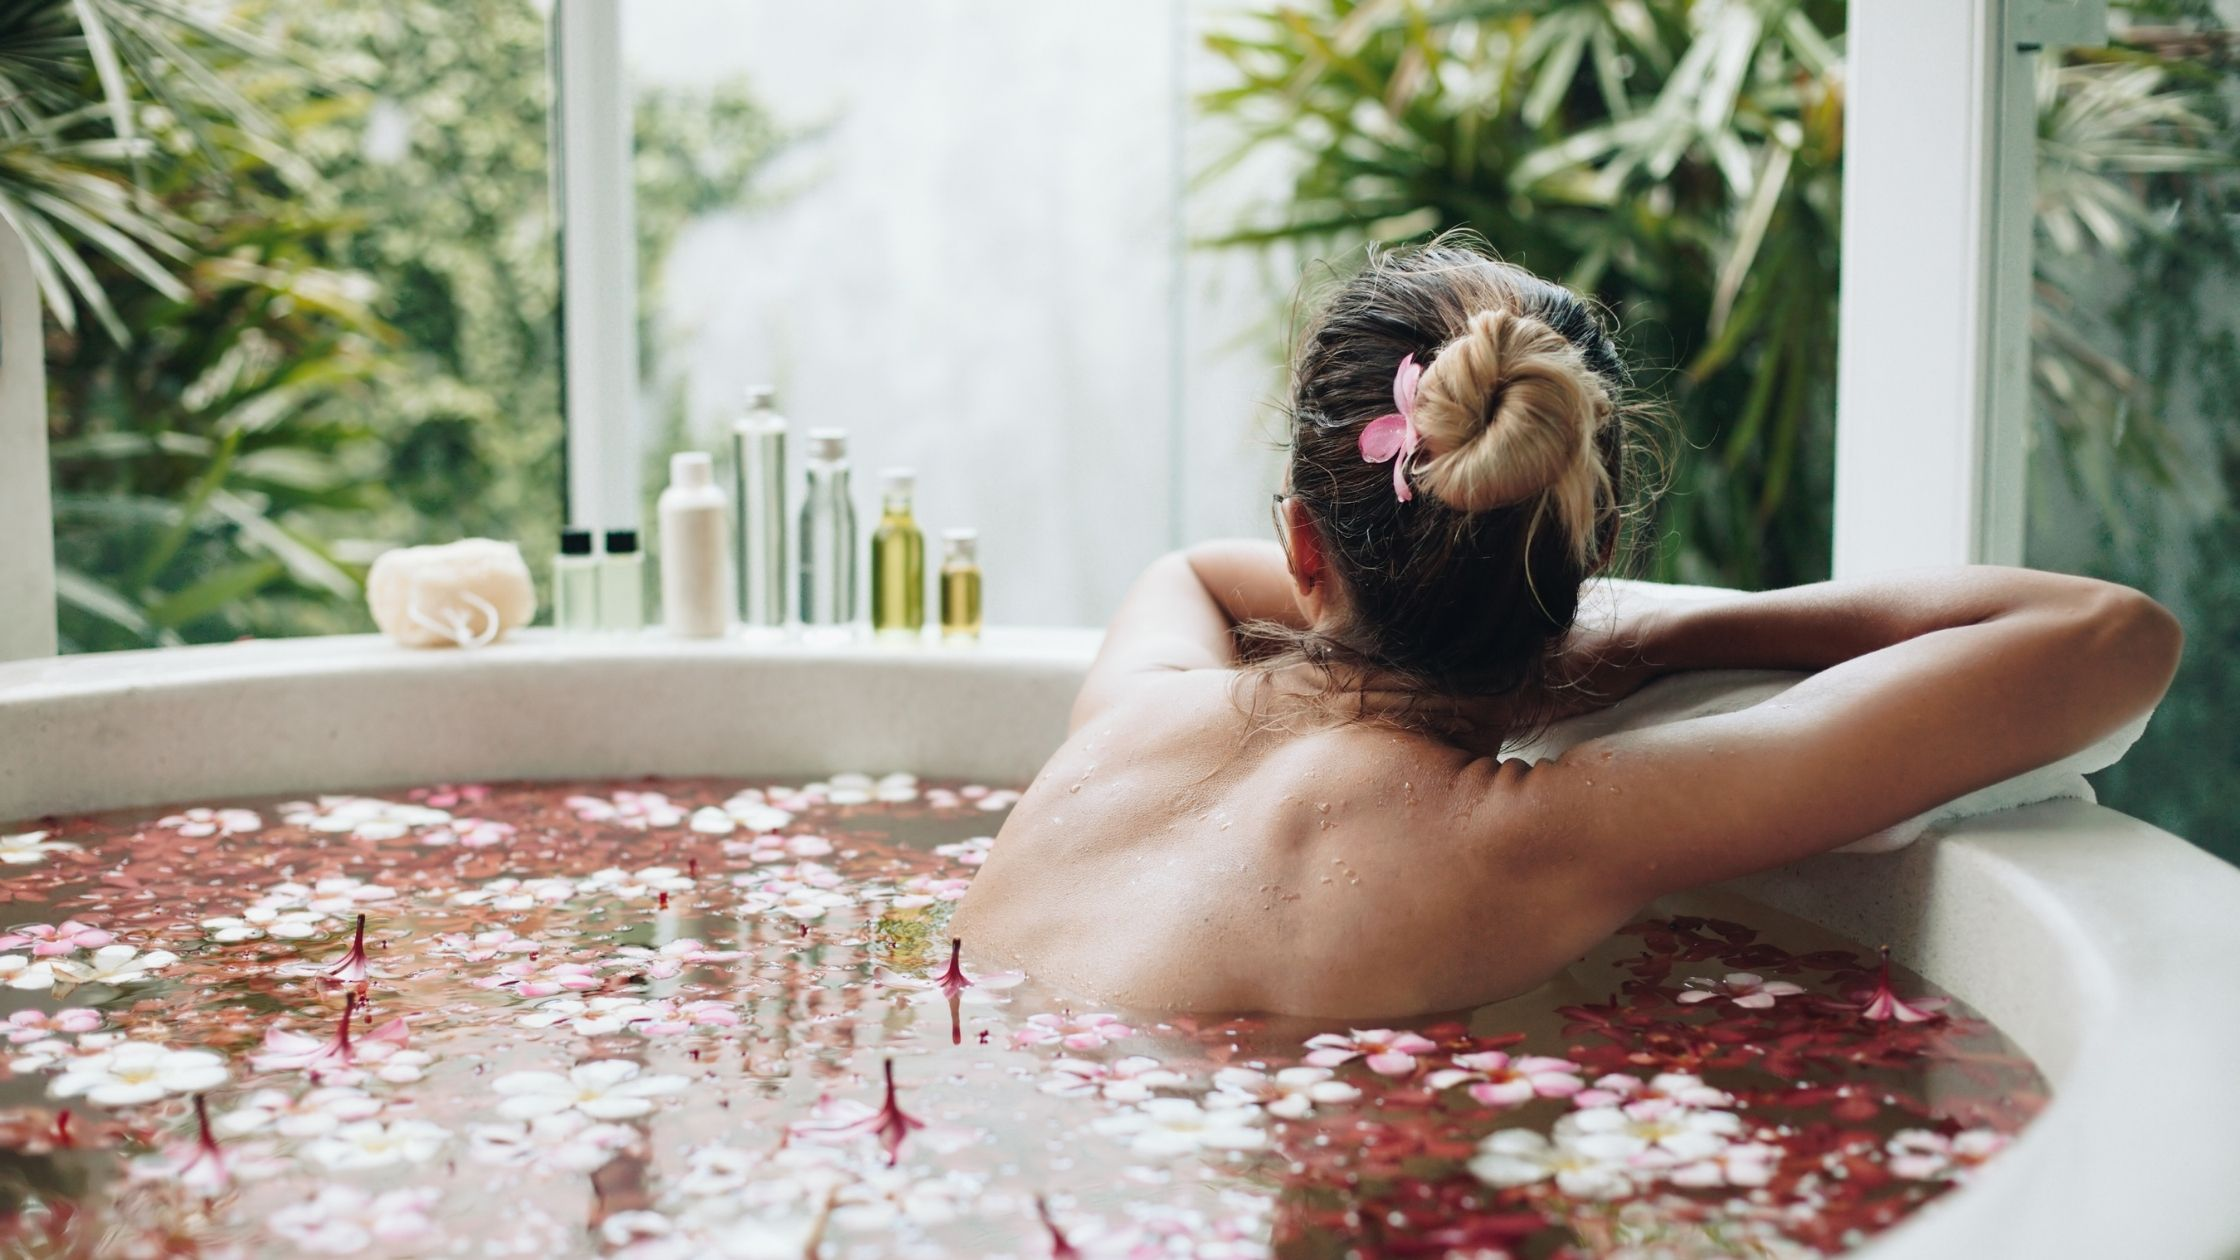 Relax & Enjoy These Hot Bath Benefits